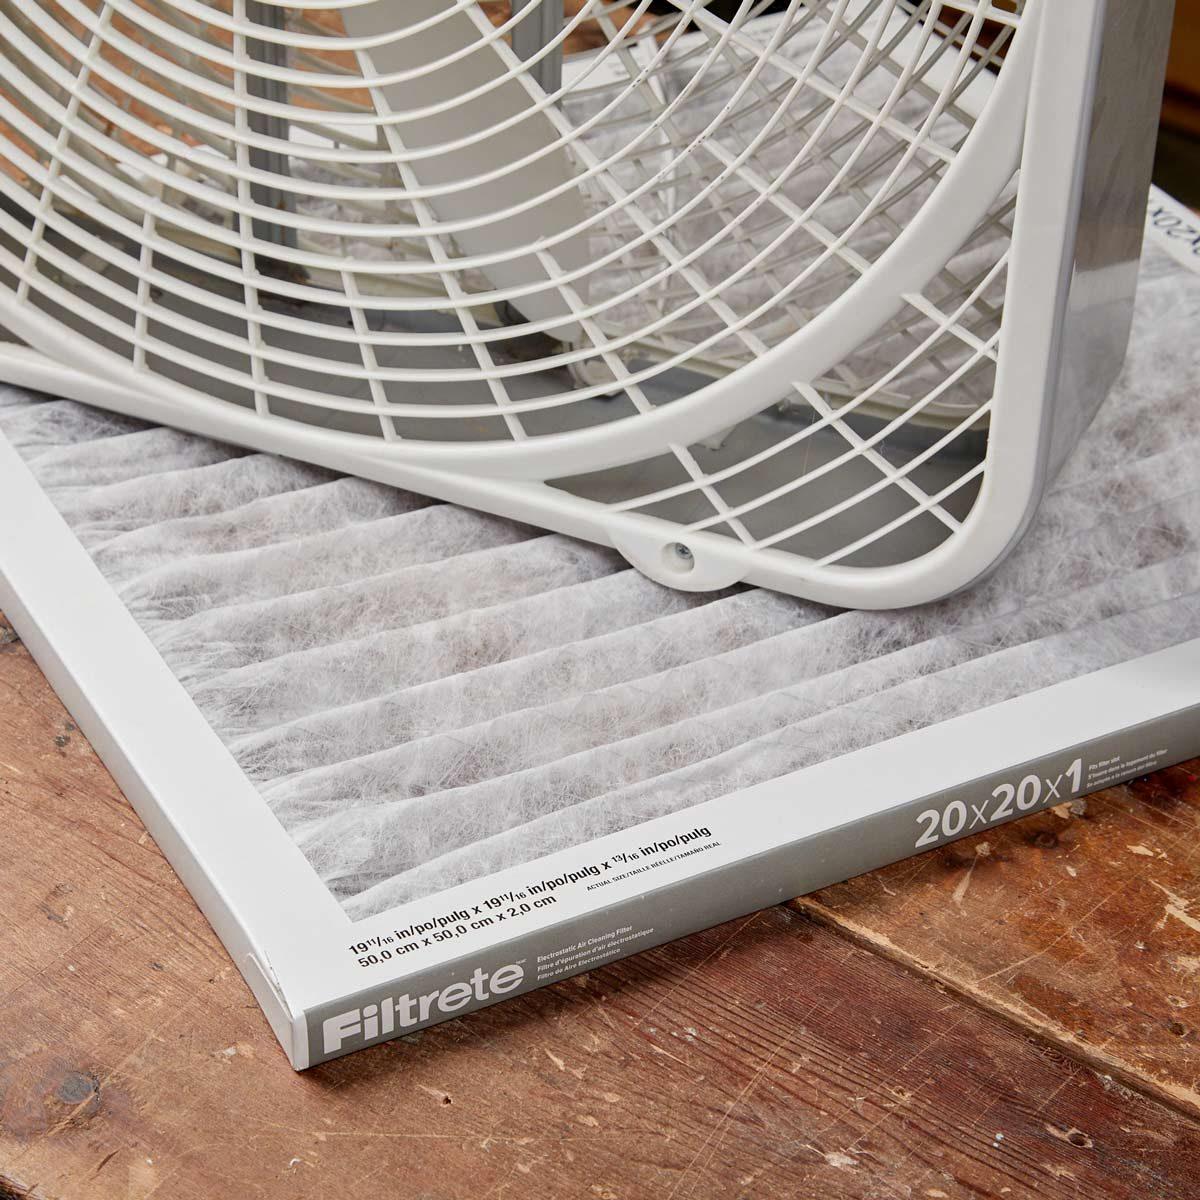 HH Handy Hint saw dust filter fan furnace filter